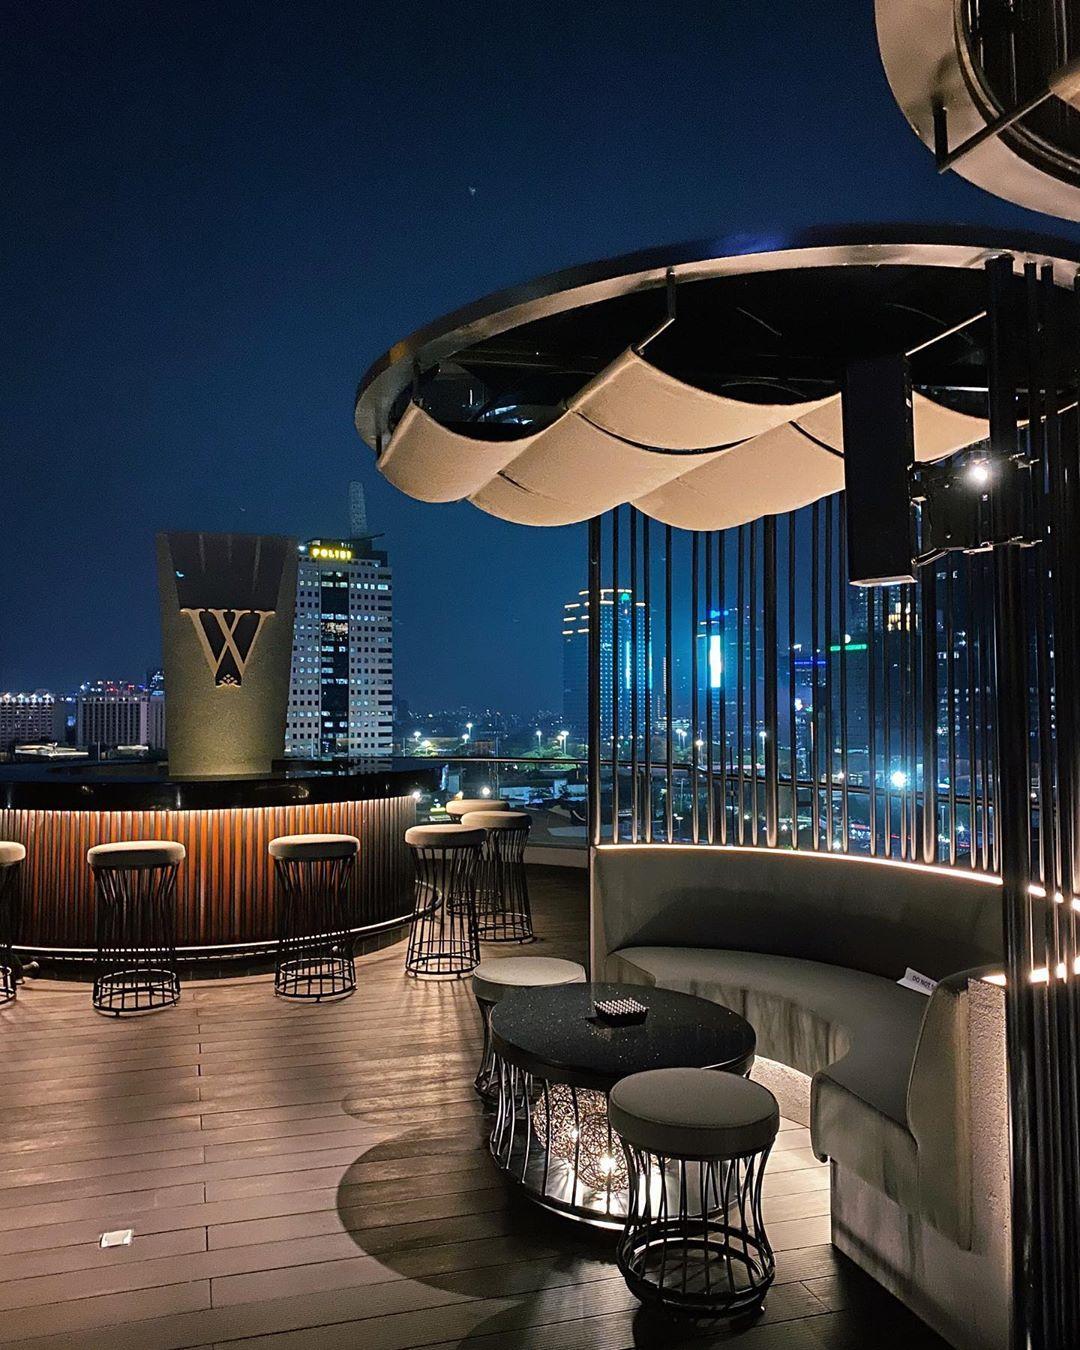 7 Restoran Romantis di Jakarta untuk Wedding Proposal